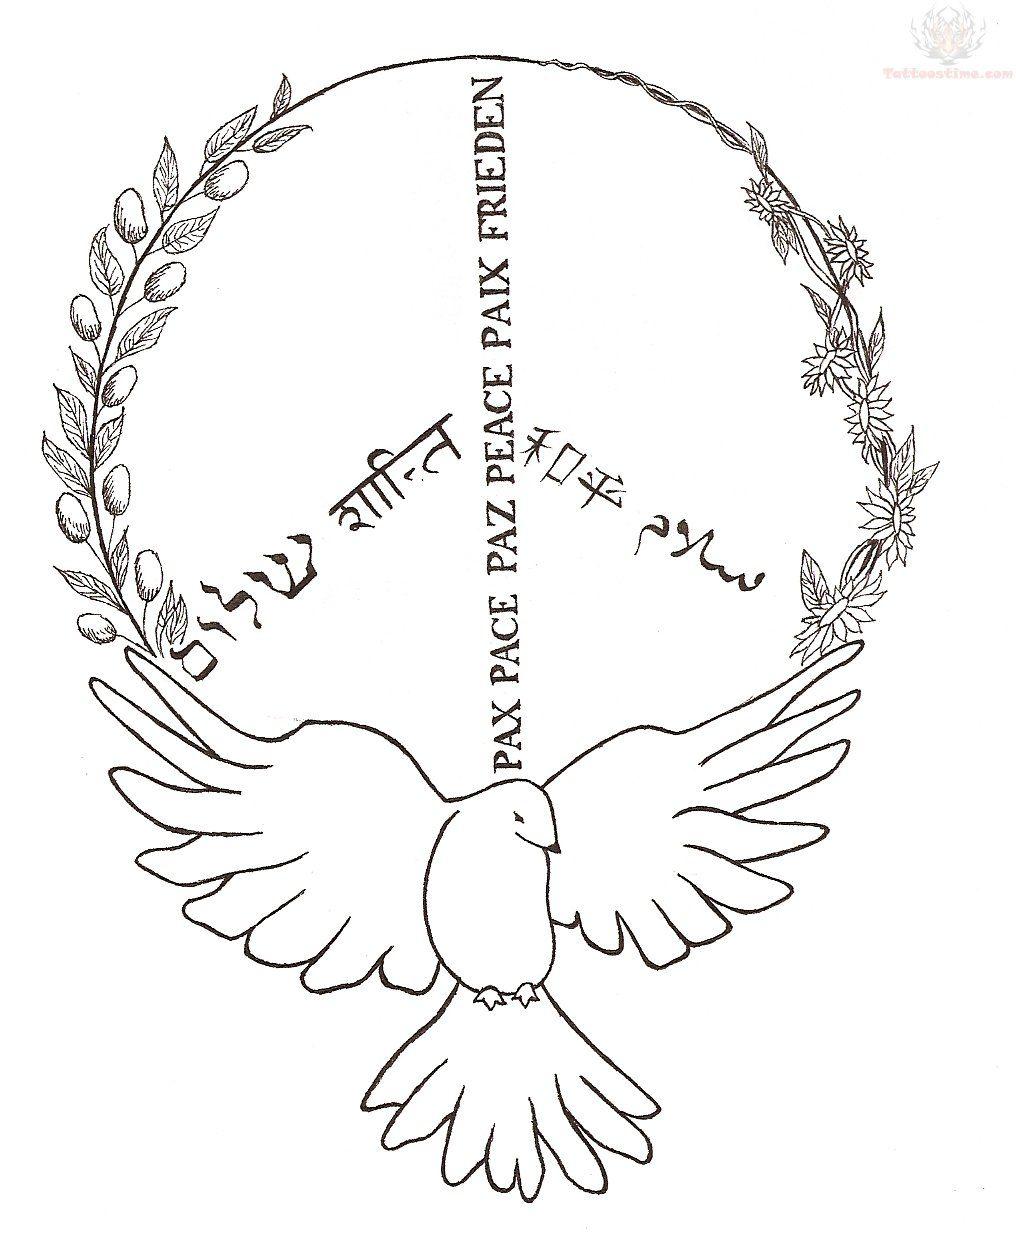 Peace Sign Tattoo With Regard To Tattoo Art Tattoo A To: Dove And Peace Sign Tattoo Design